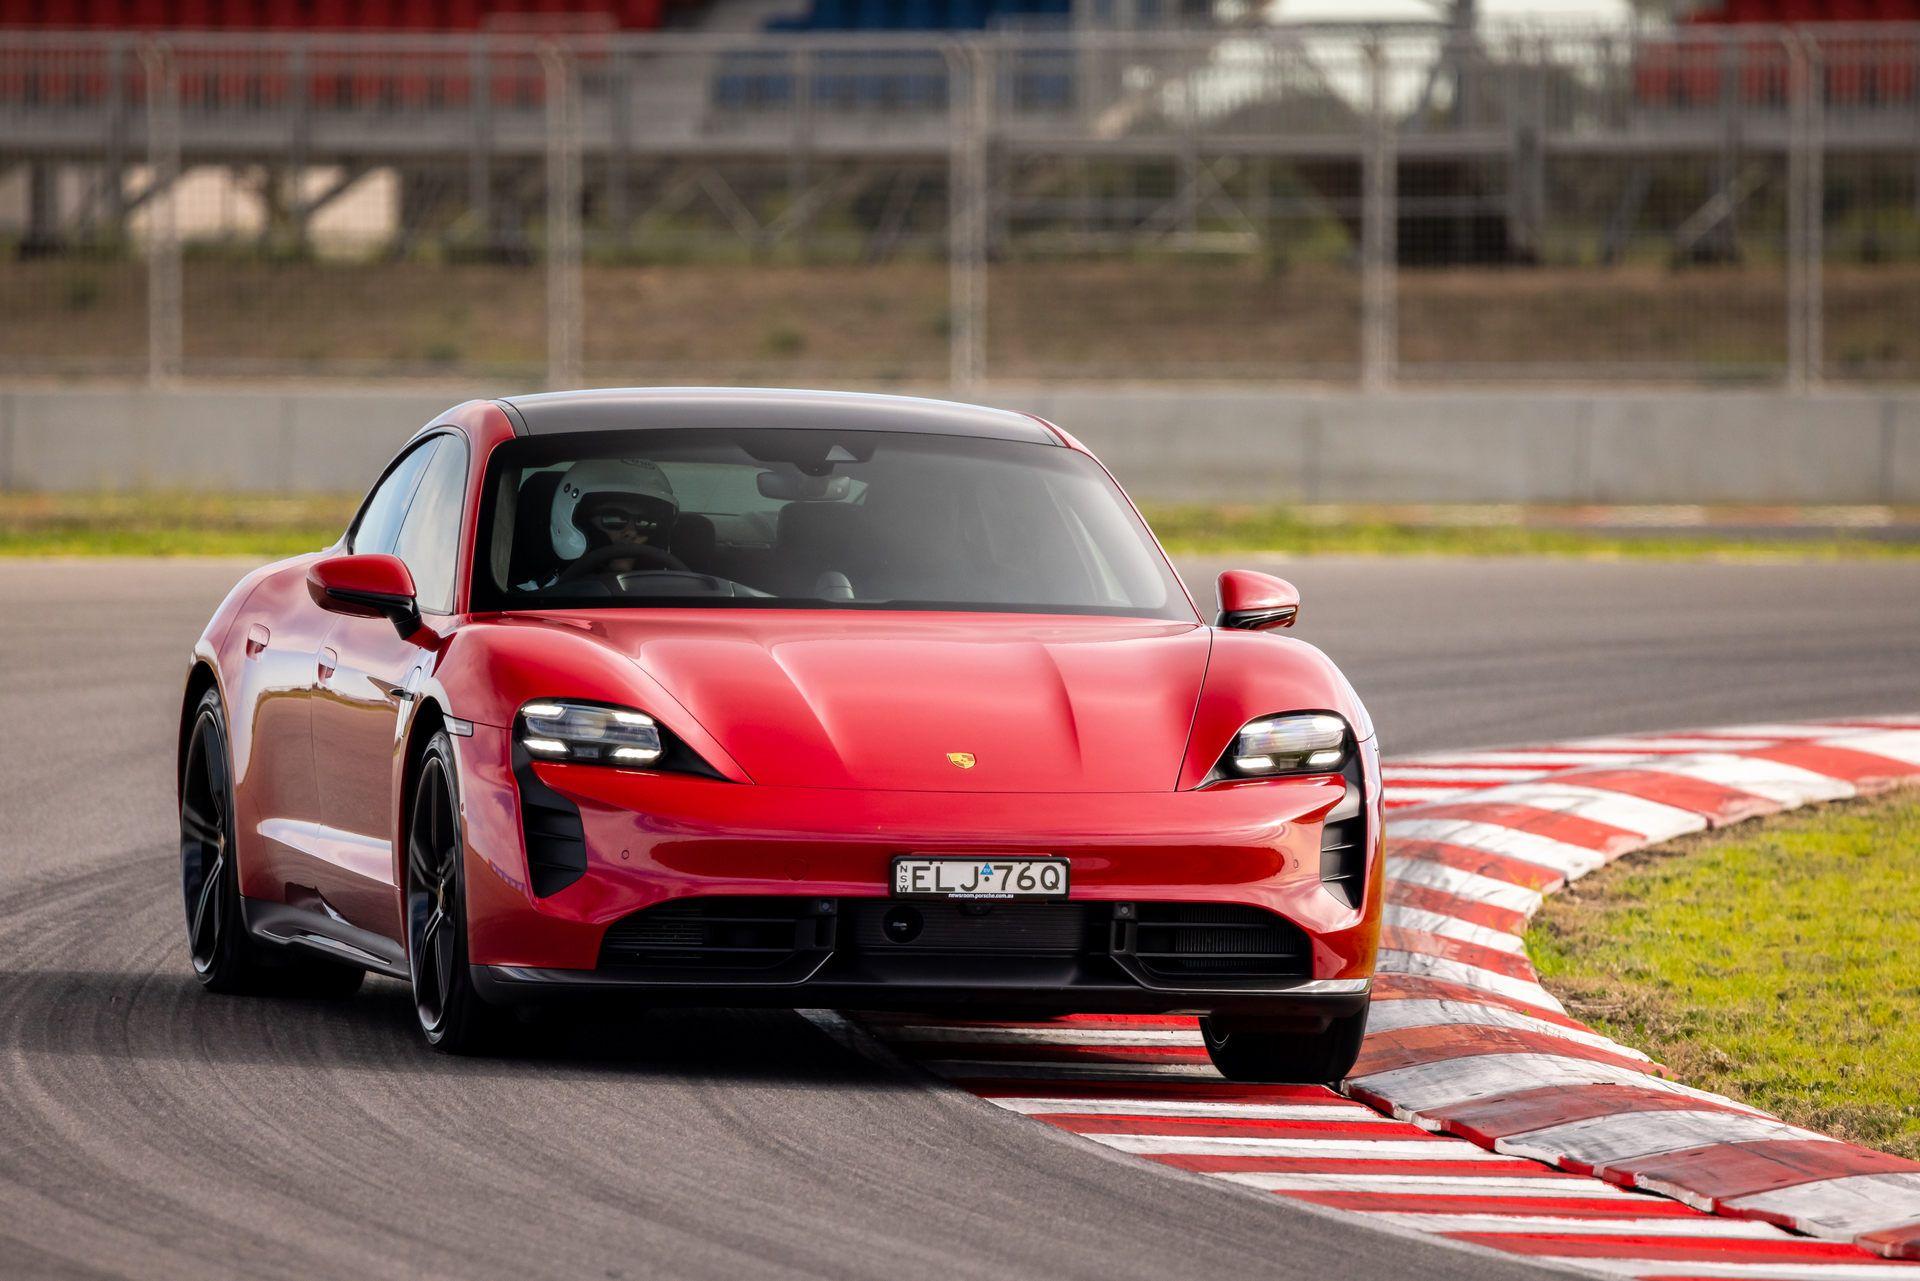 Porsche-Taycan-Turbo-S-The-Bend-Motorsport-Park-8